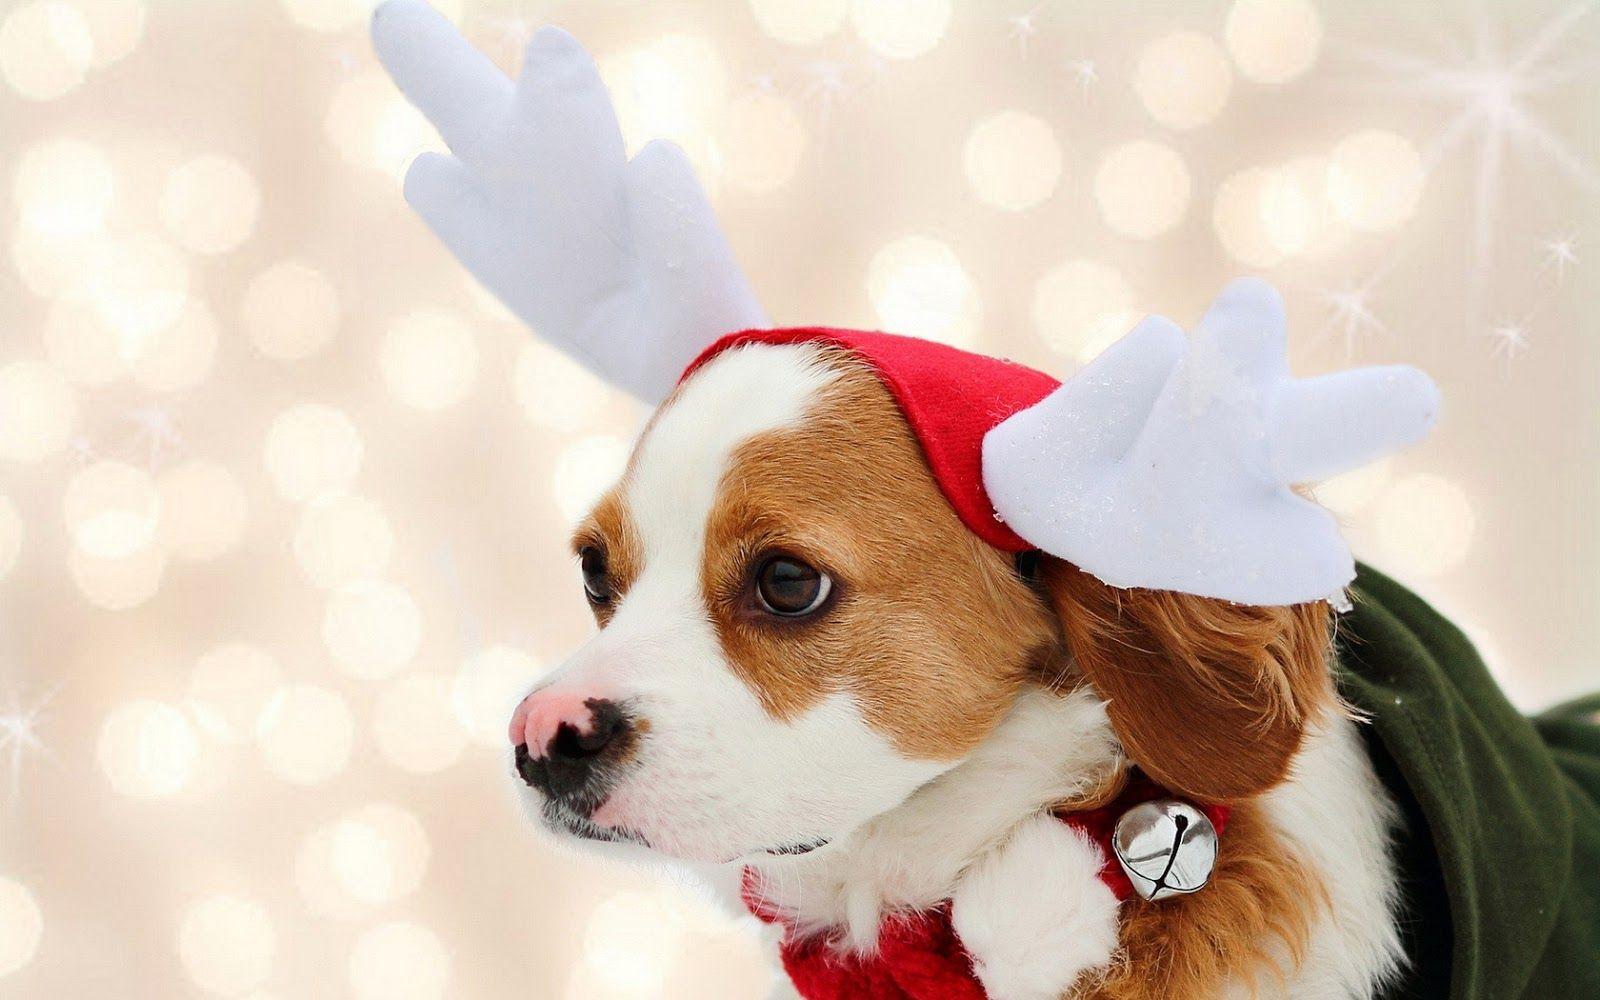 Baby Dog Wearing Christmas Cap Wallpaper Cute Dog Pictures Funny Dog Pictures Christmas Animals